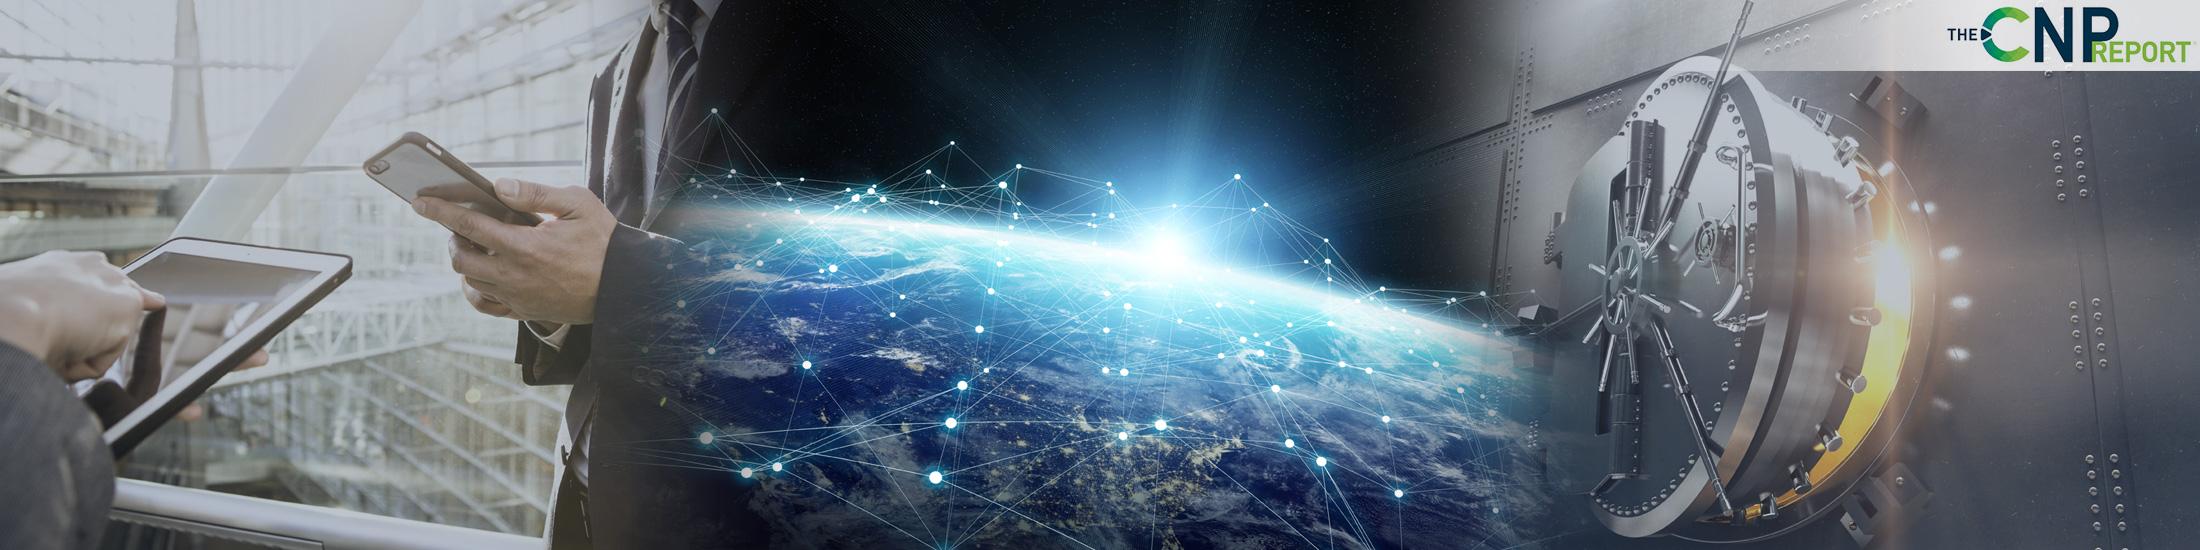 Economies Shift to Digital & Mobile, Threats Increase